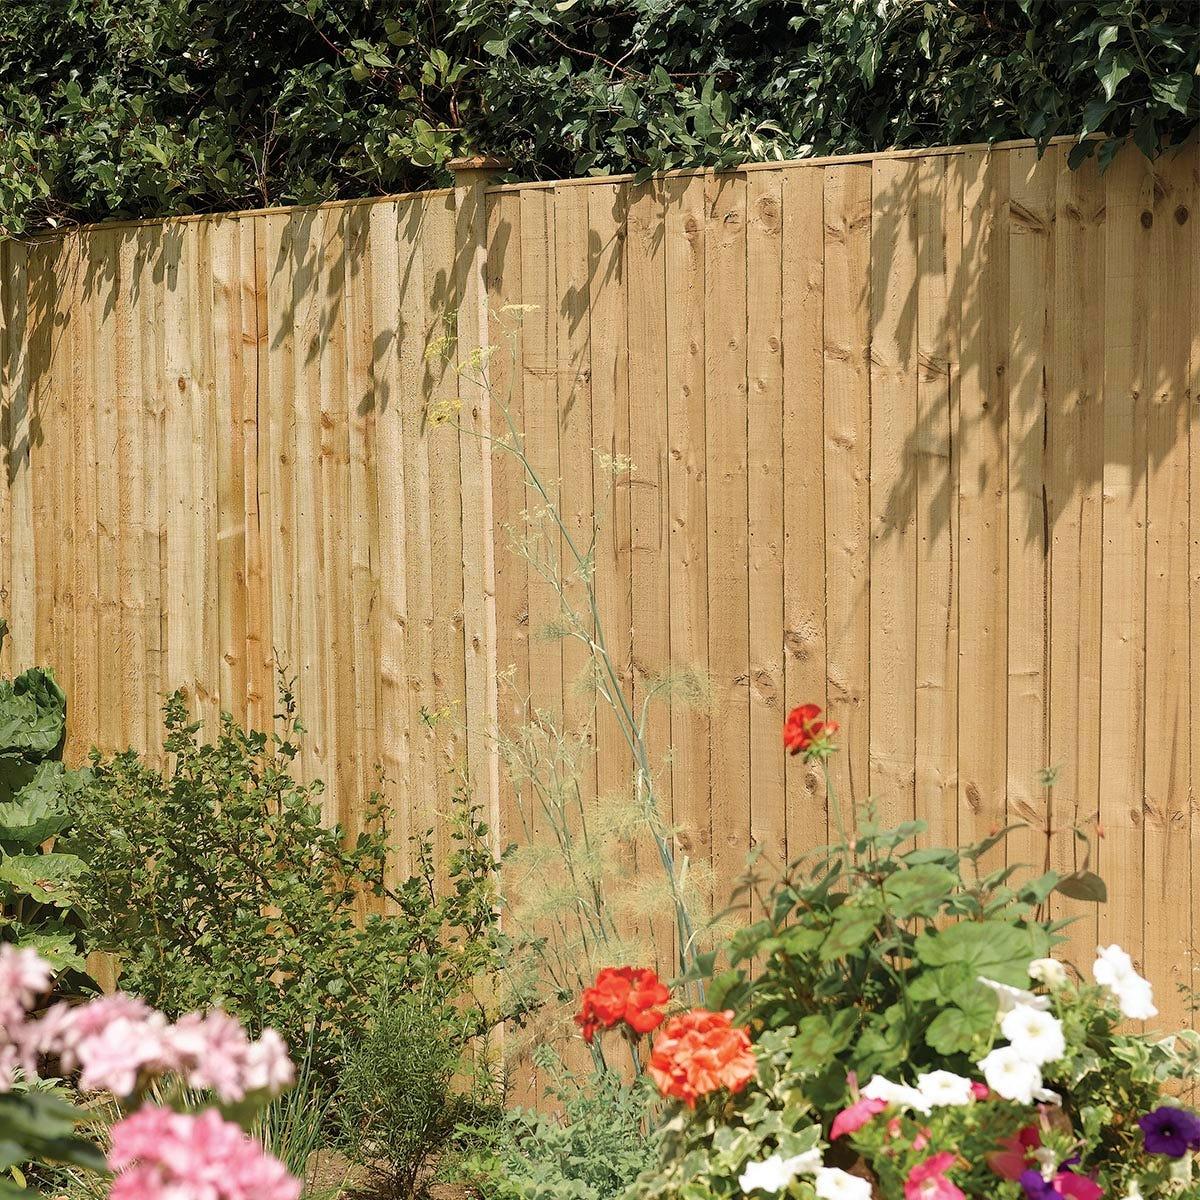 Rowlinson 3pk Vertical Board Panel Pressure Treated Fence - 6x5